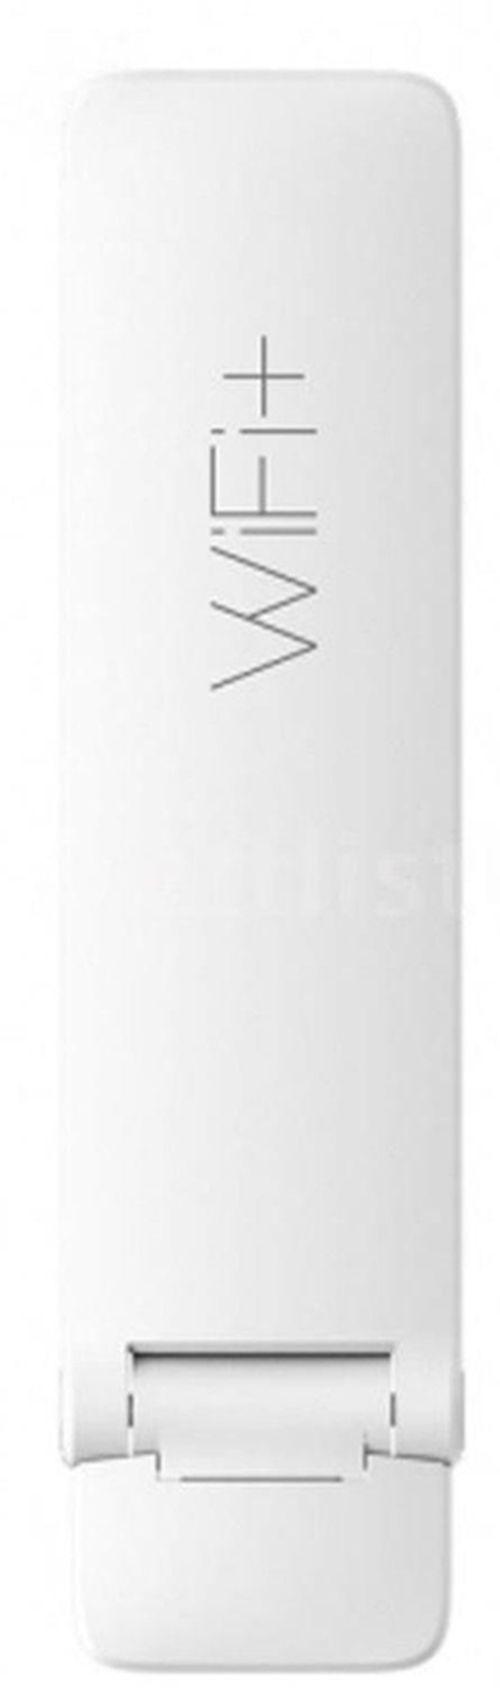 купить Wi-Fi роутер Xiaomi Reapeter 2 300M в Кишинёве